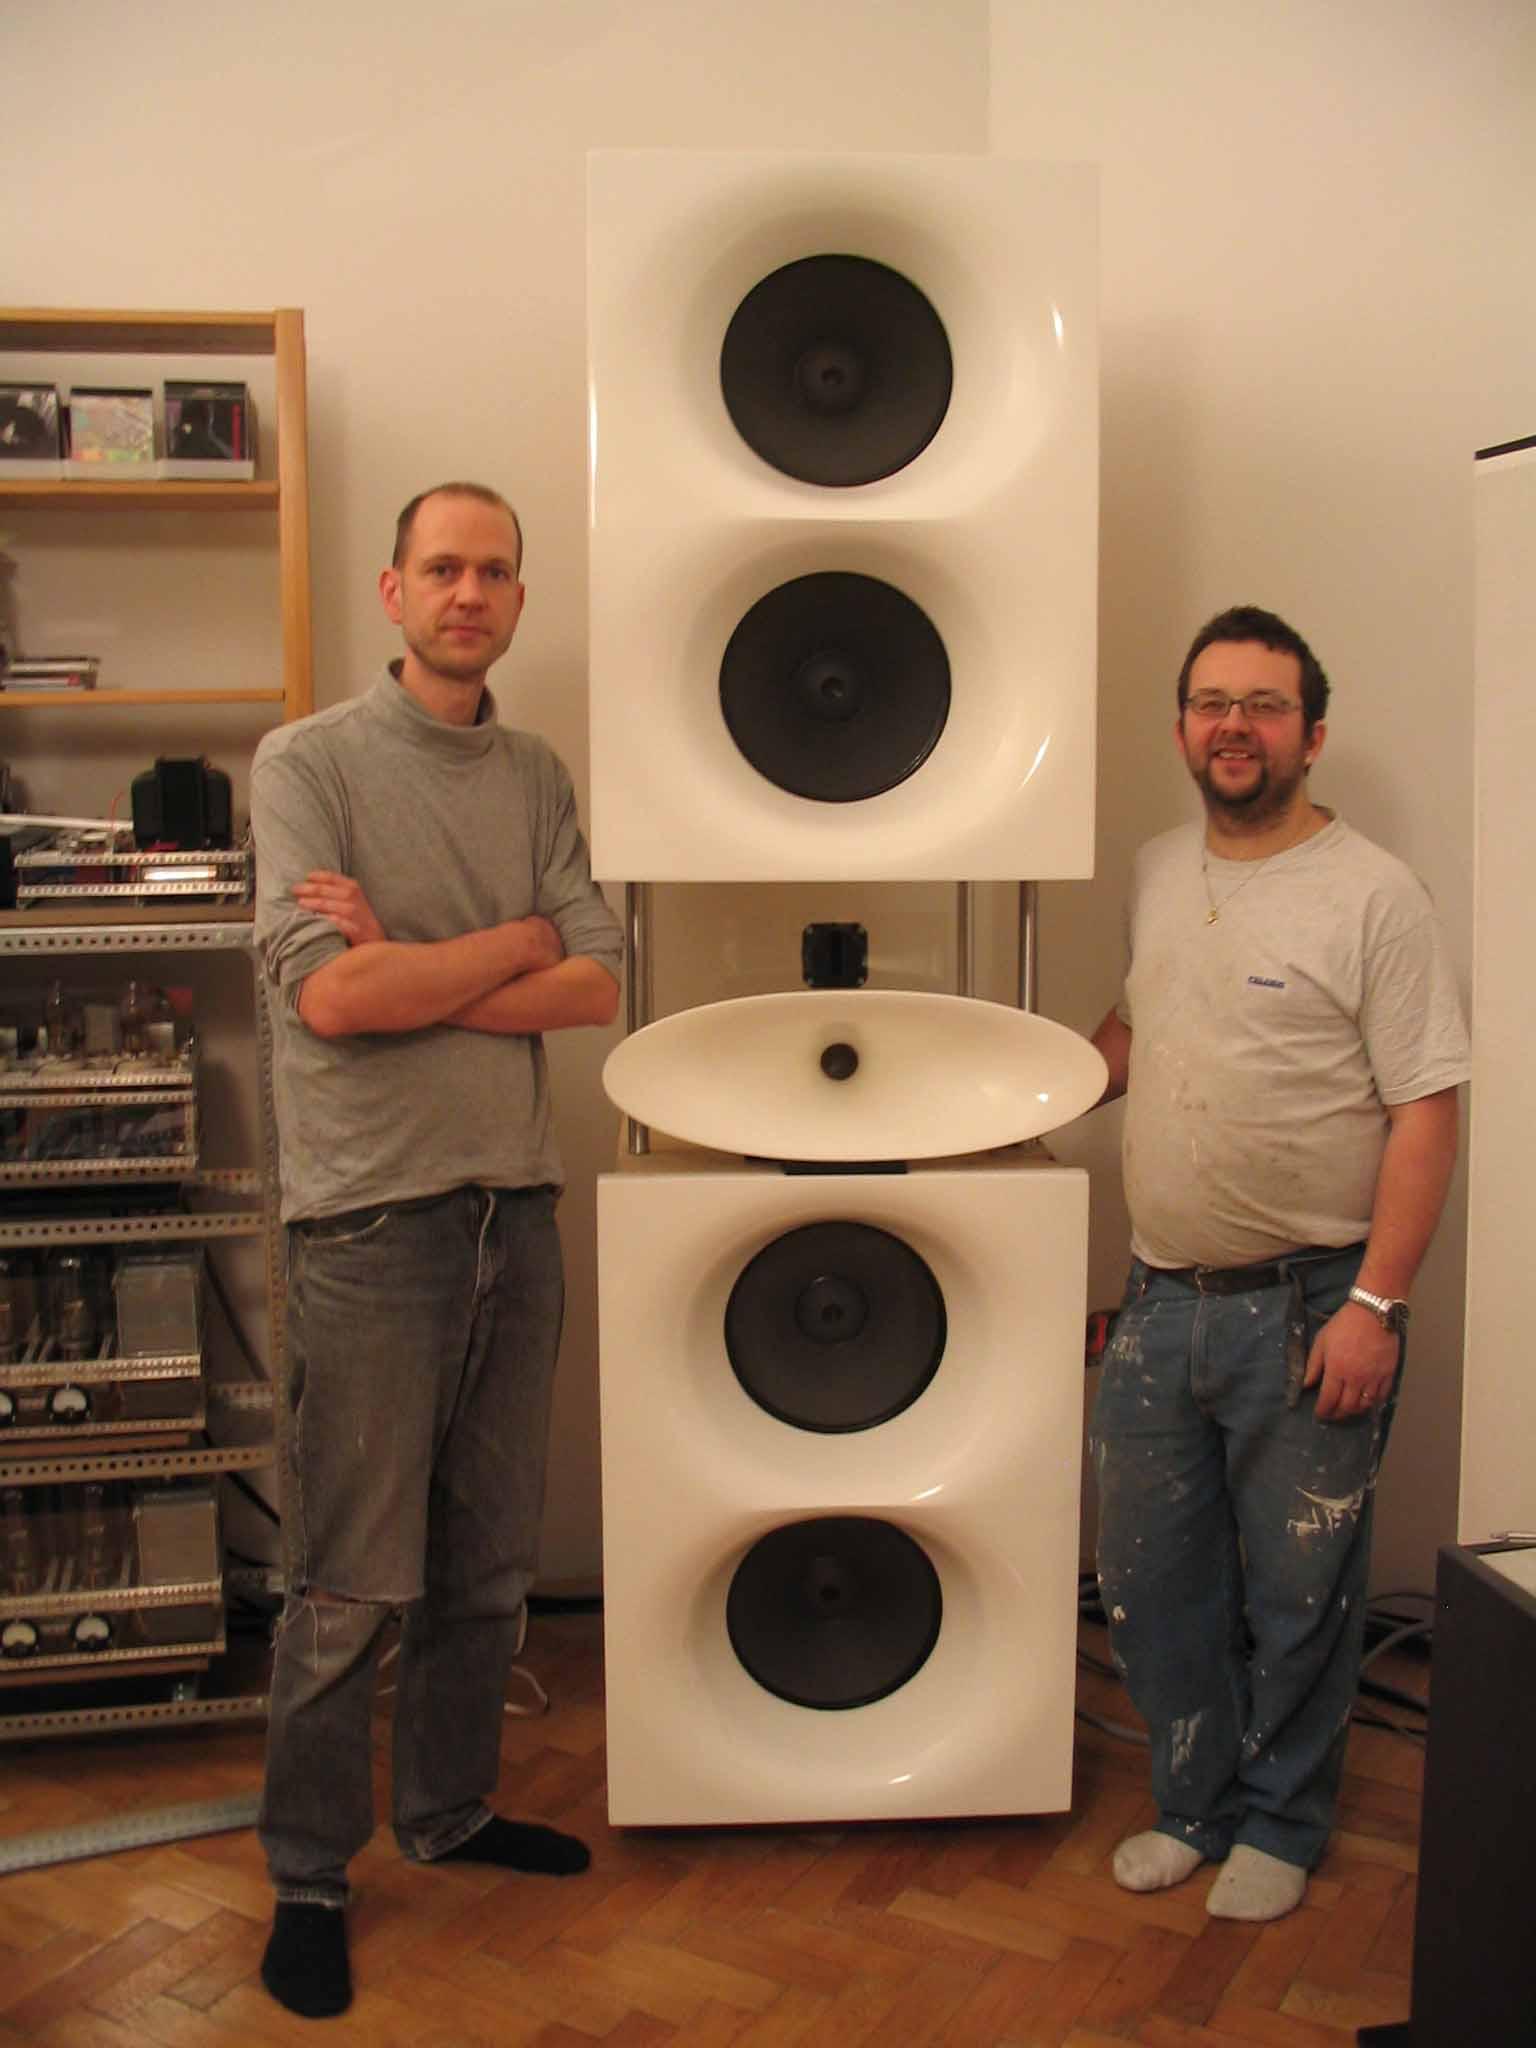 The Audio Eagle - Joe's Loudspeaker Dream Comes True